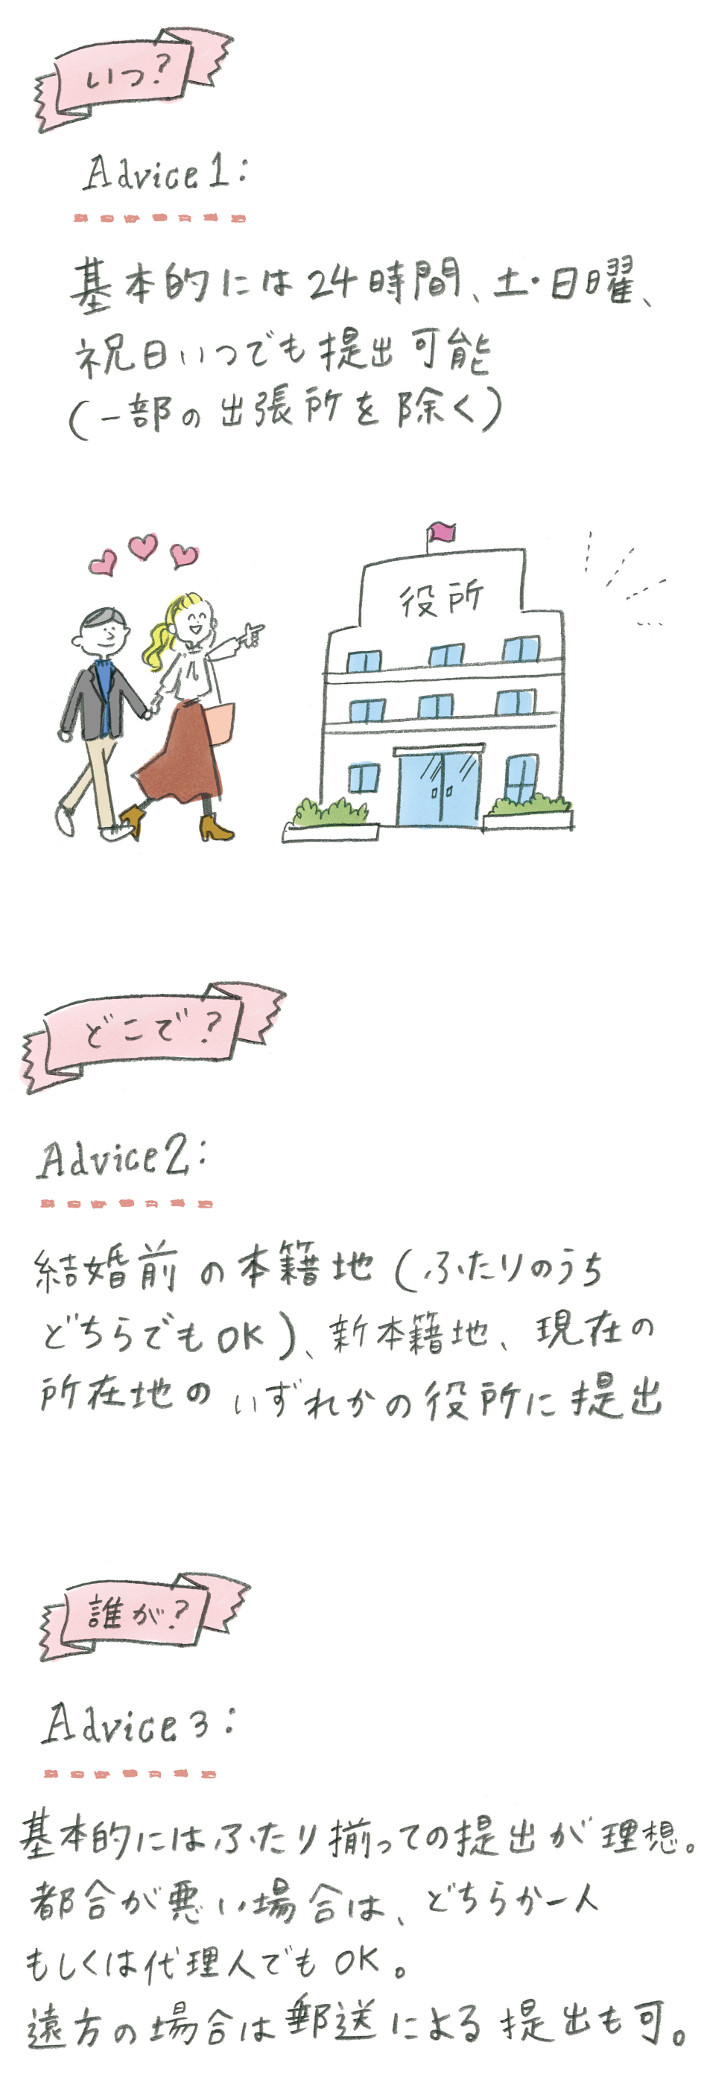 STEP4. 婚姻届の提出